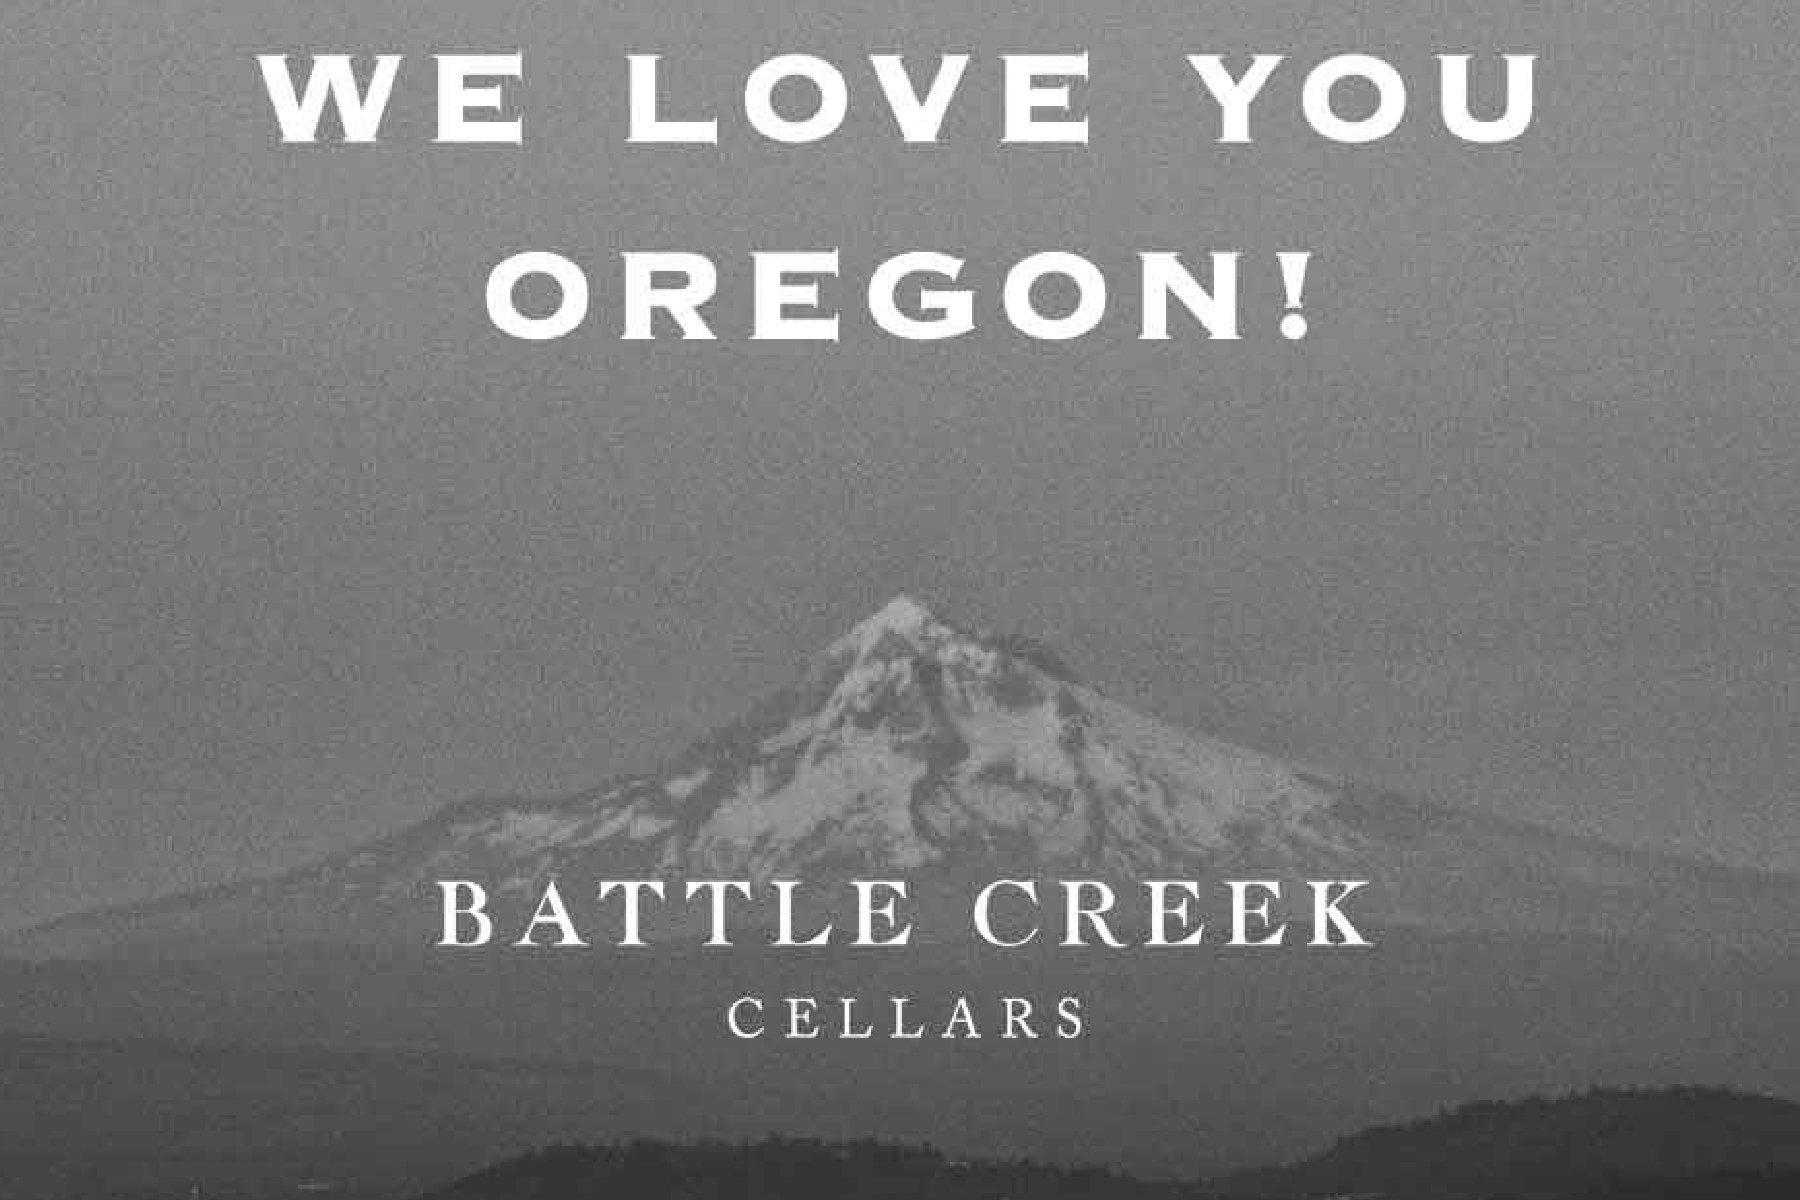 Battle Creek Cellars Oregon Food Bank Fundraiser 2020